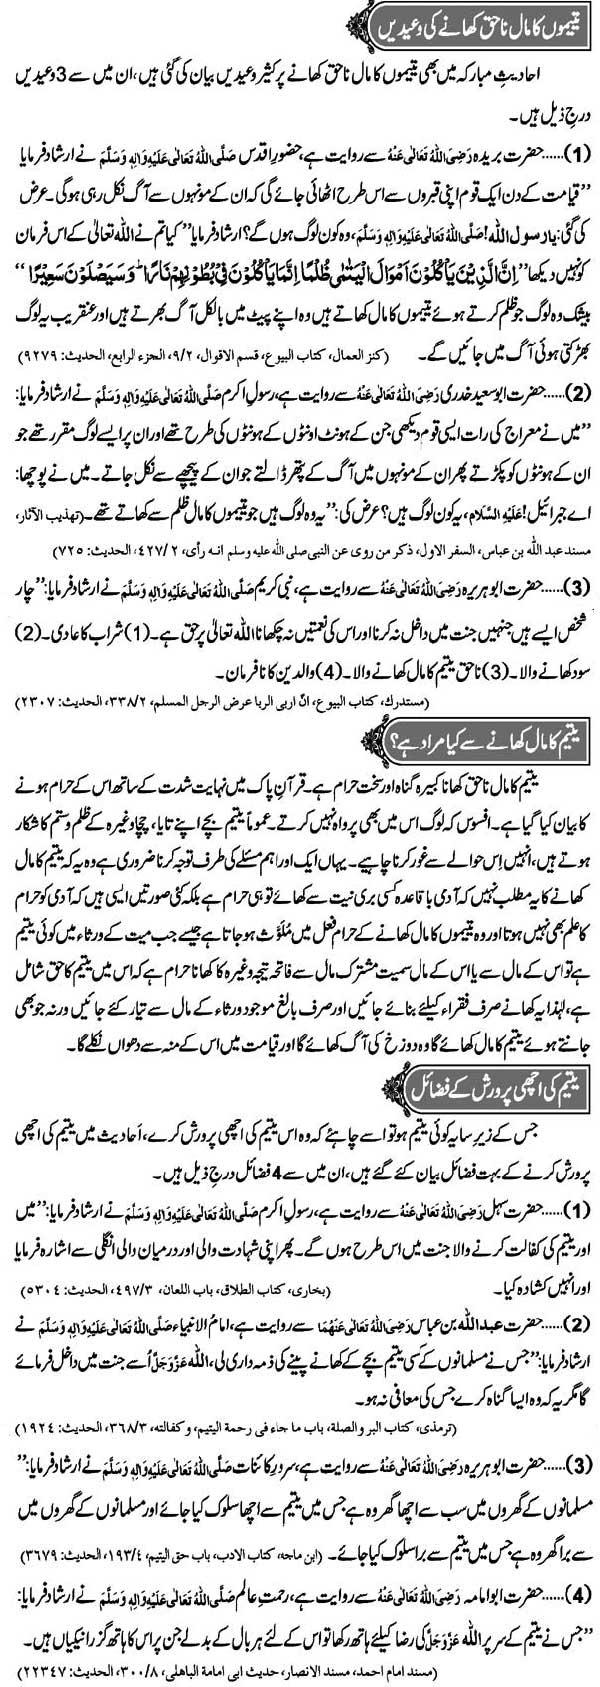 Yateem Ka Maal Na Haq Khane Ki Waeed